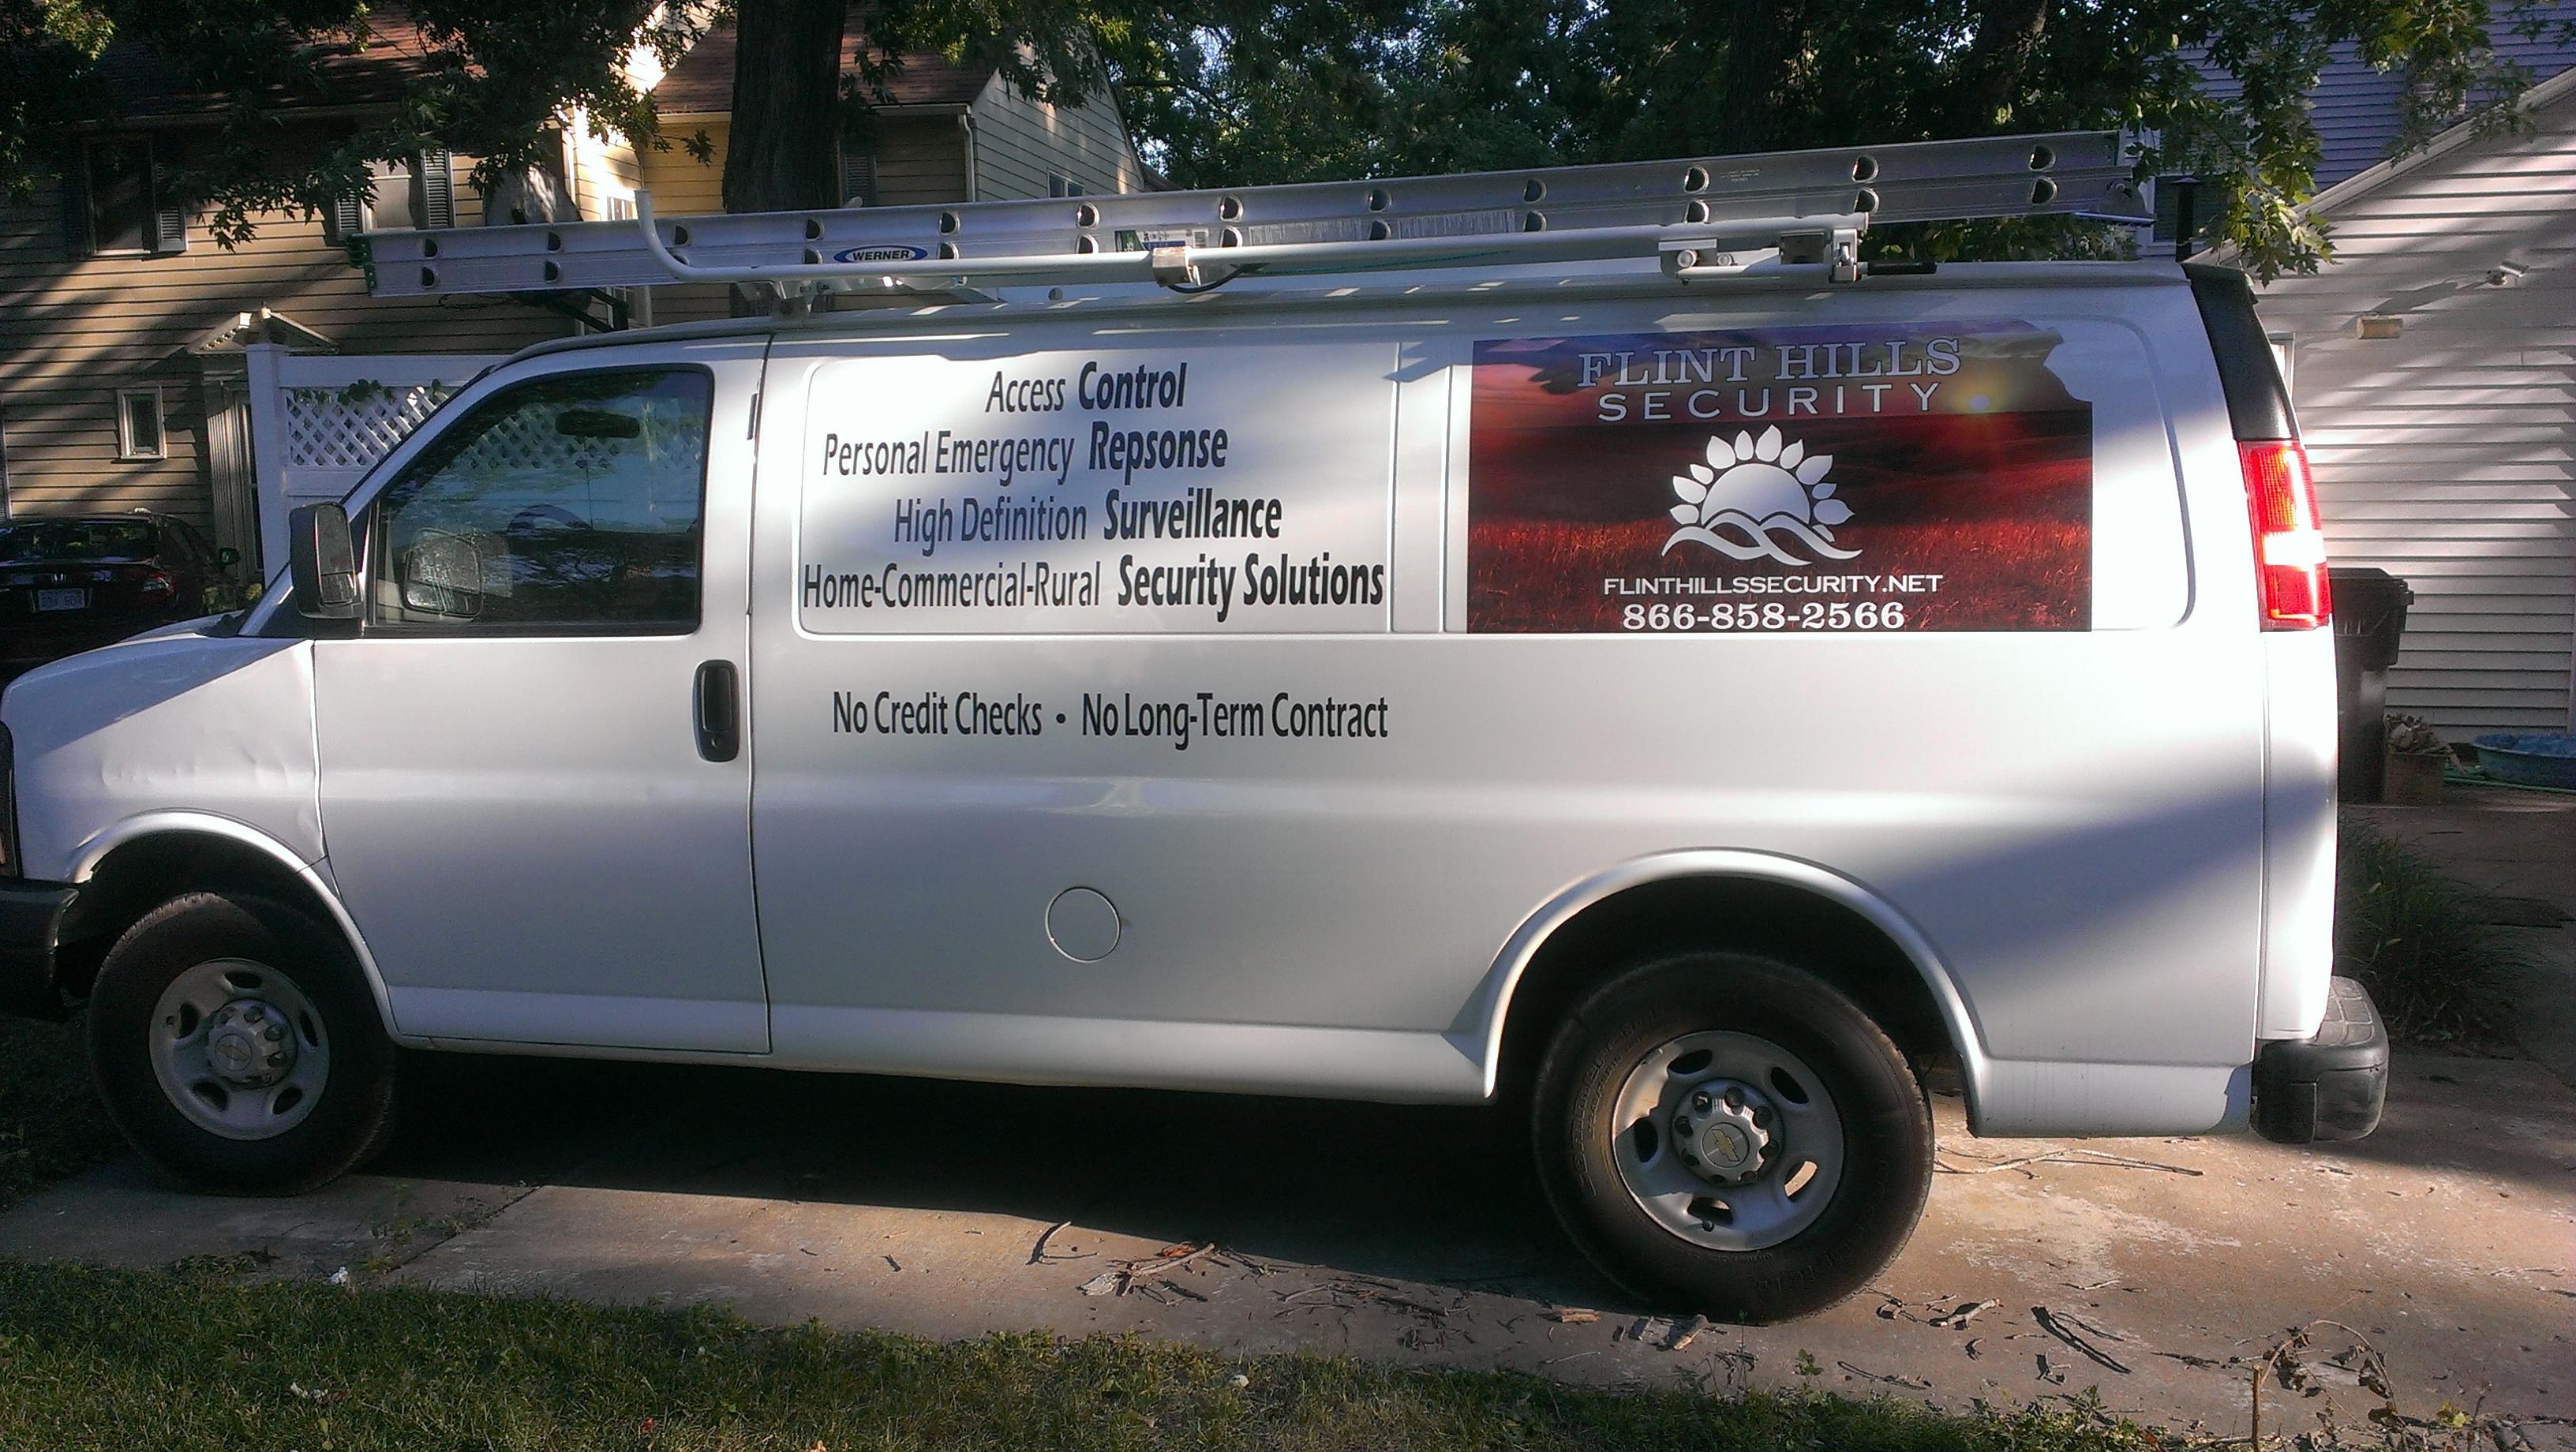 Flint Hills Security - ad image